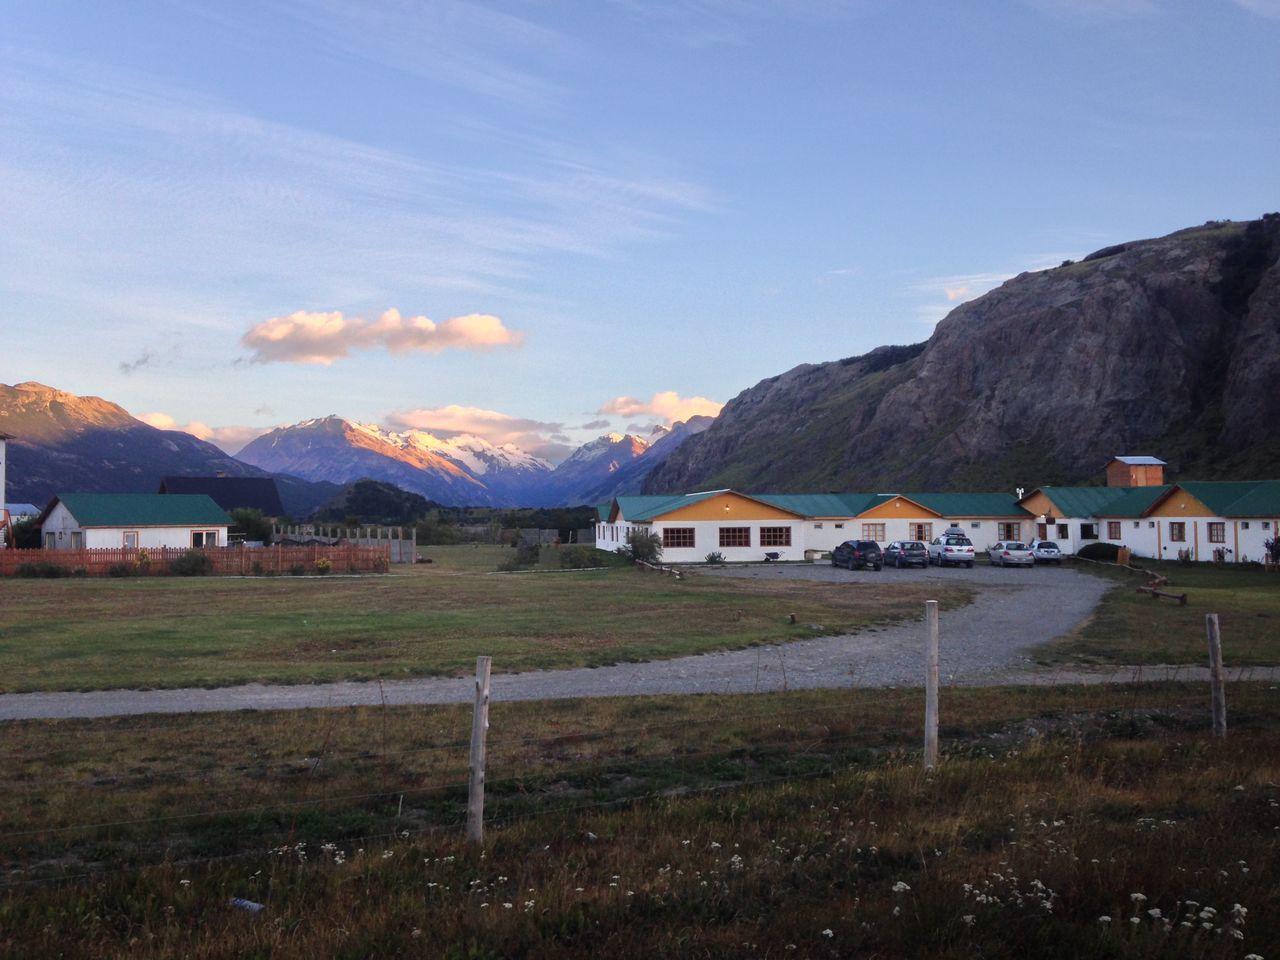 Beautiful alpine scenery with cloudy sky